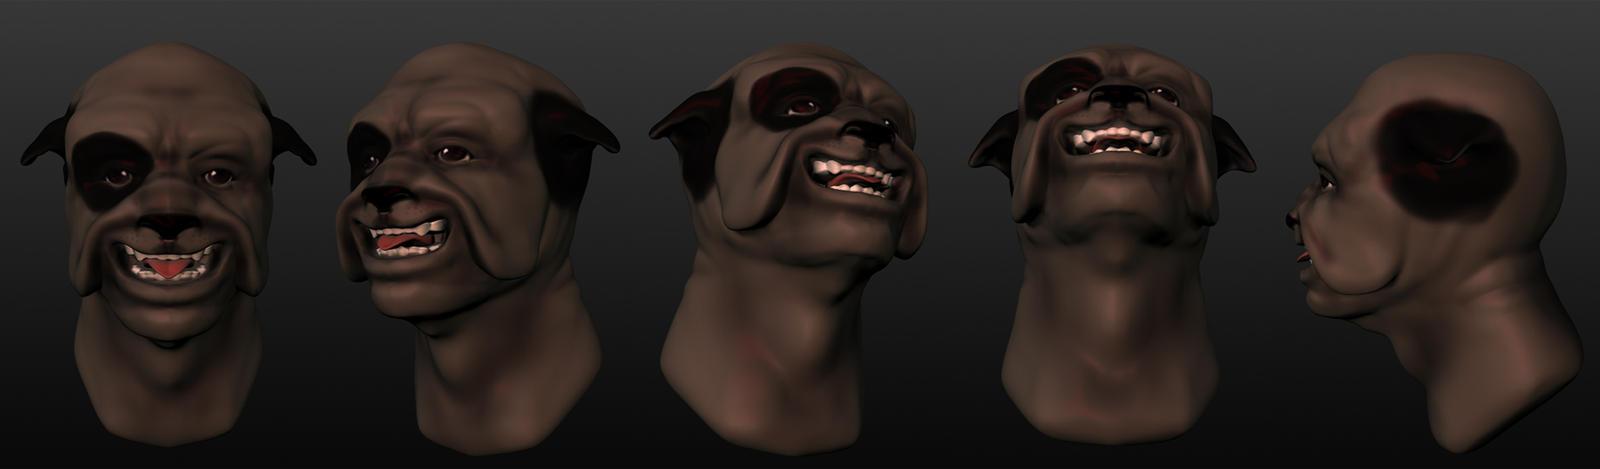 Bulldog Man